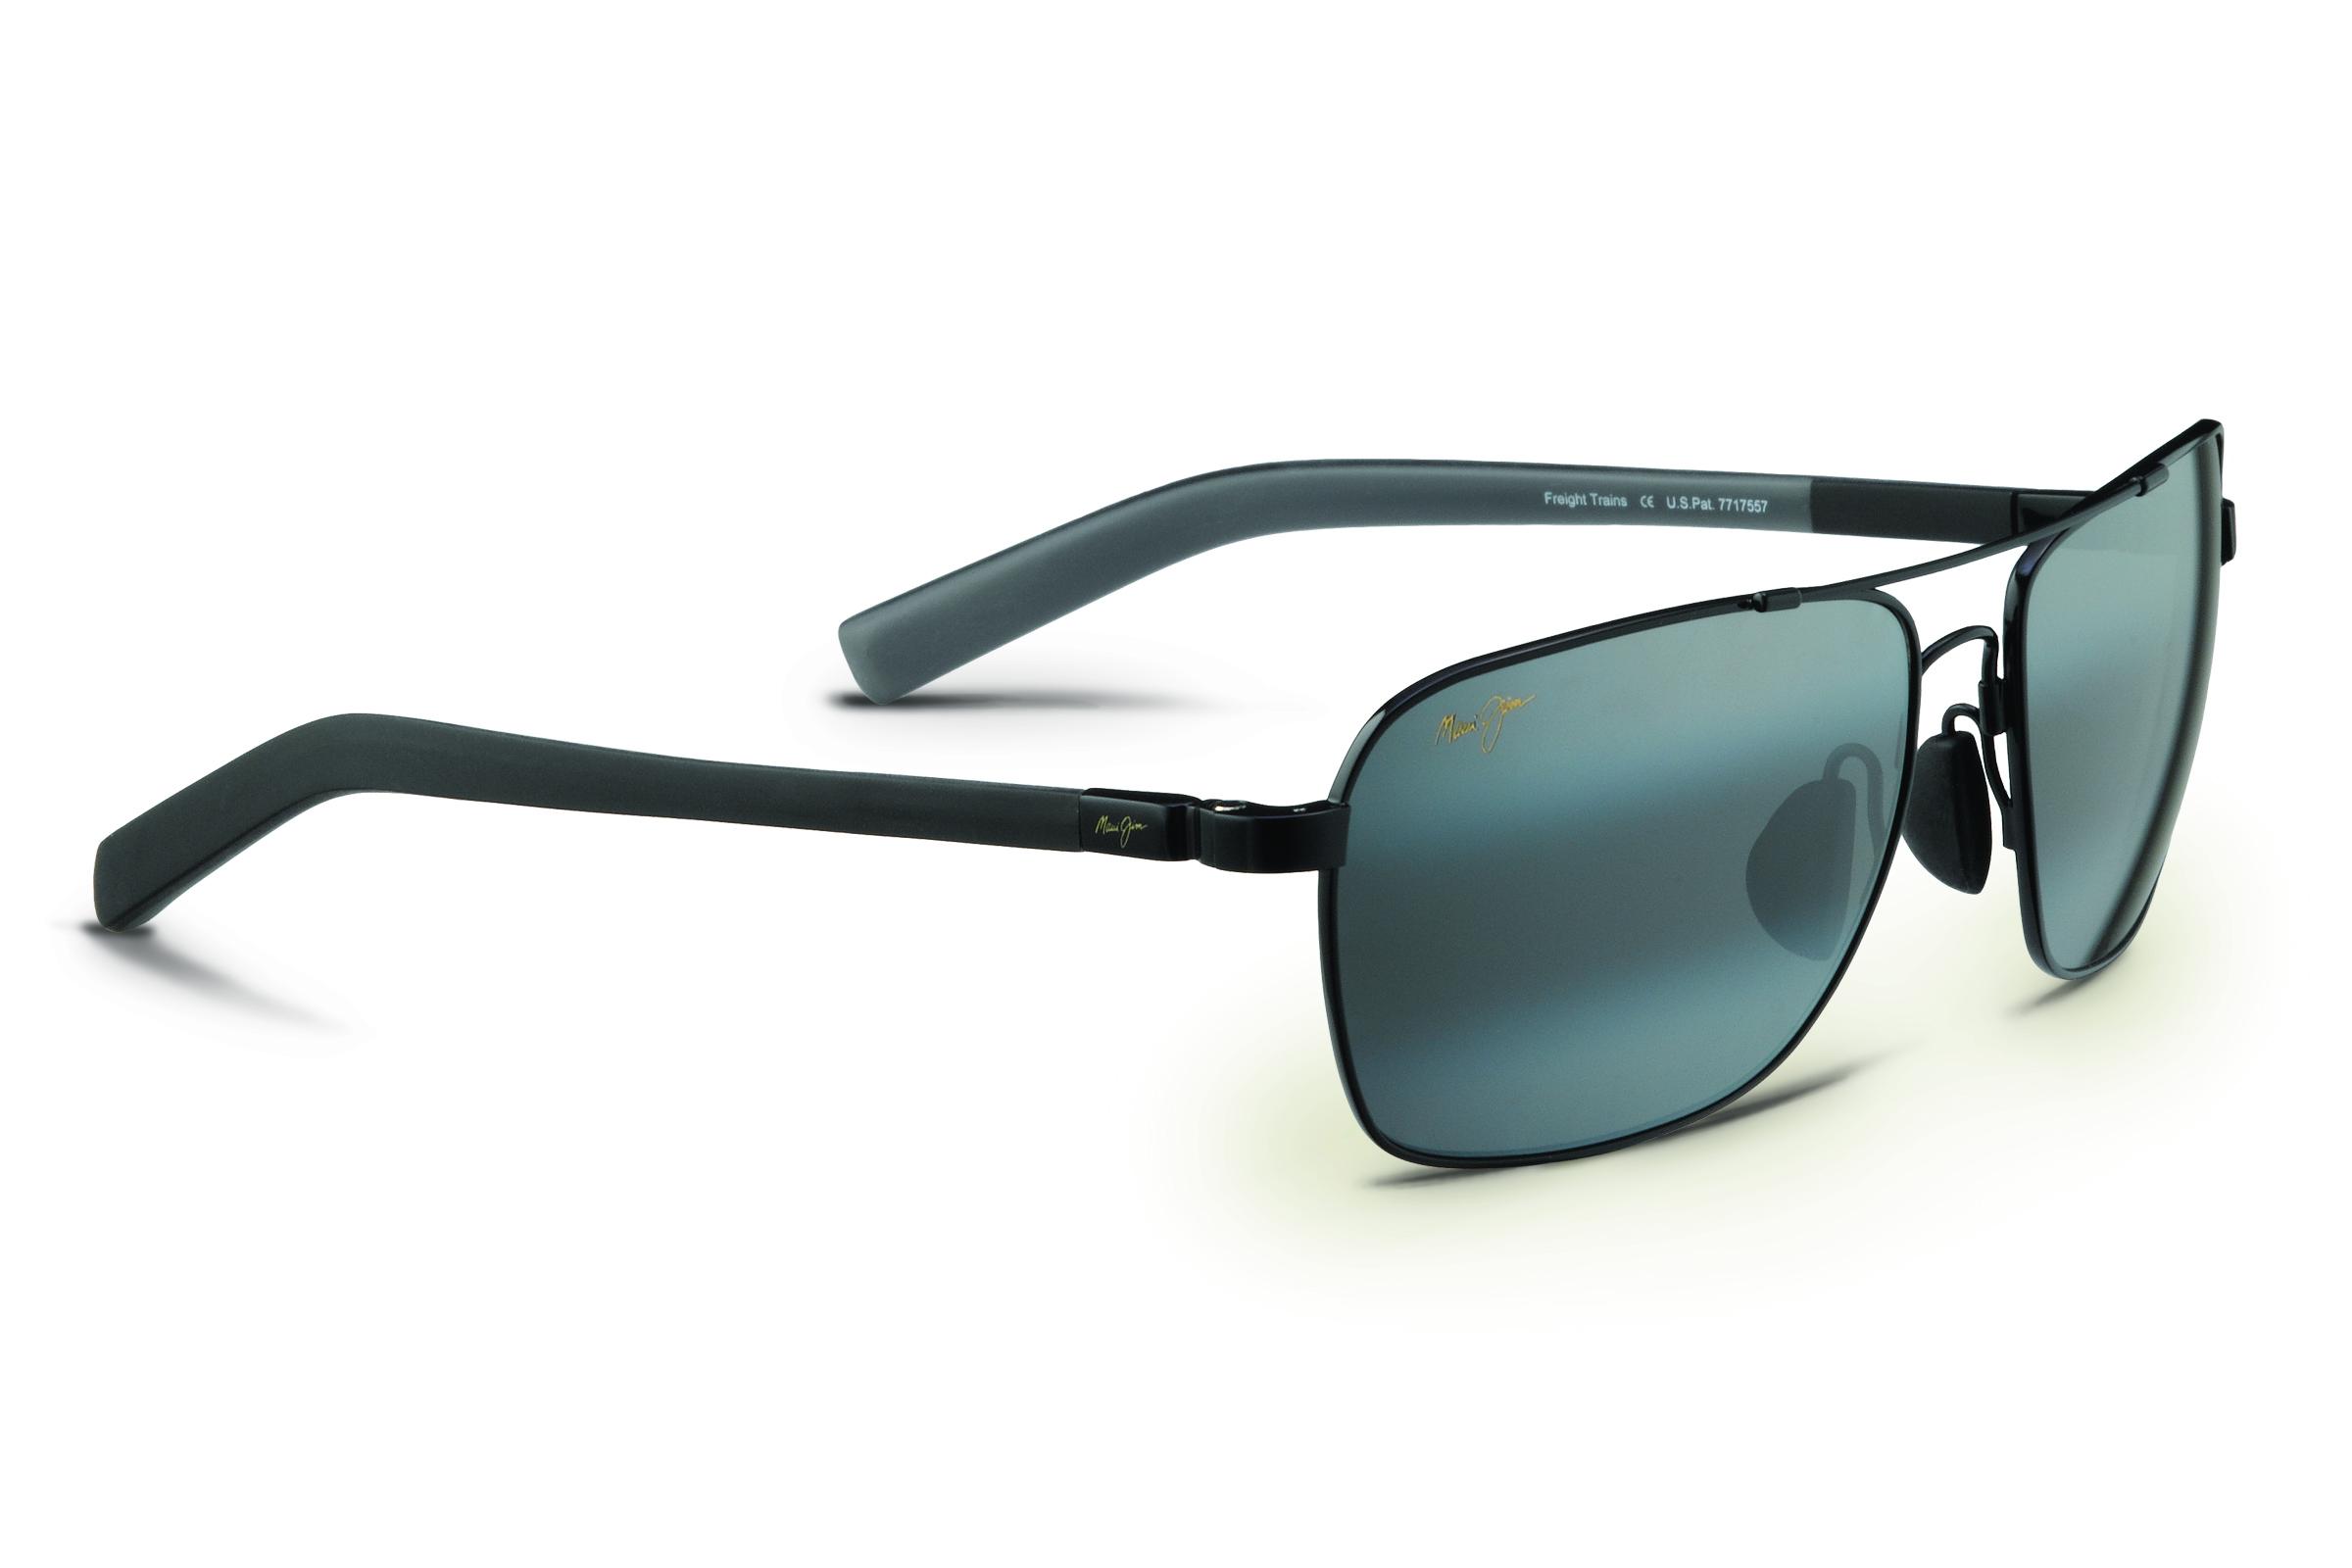 50cd4976e6 Maui Jim Freight Trains Sunglasses